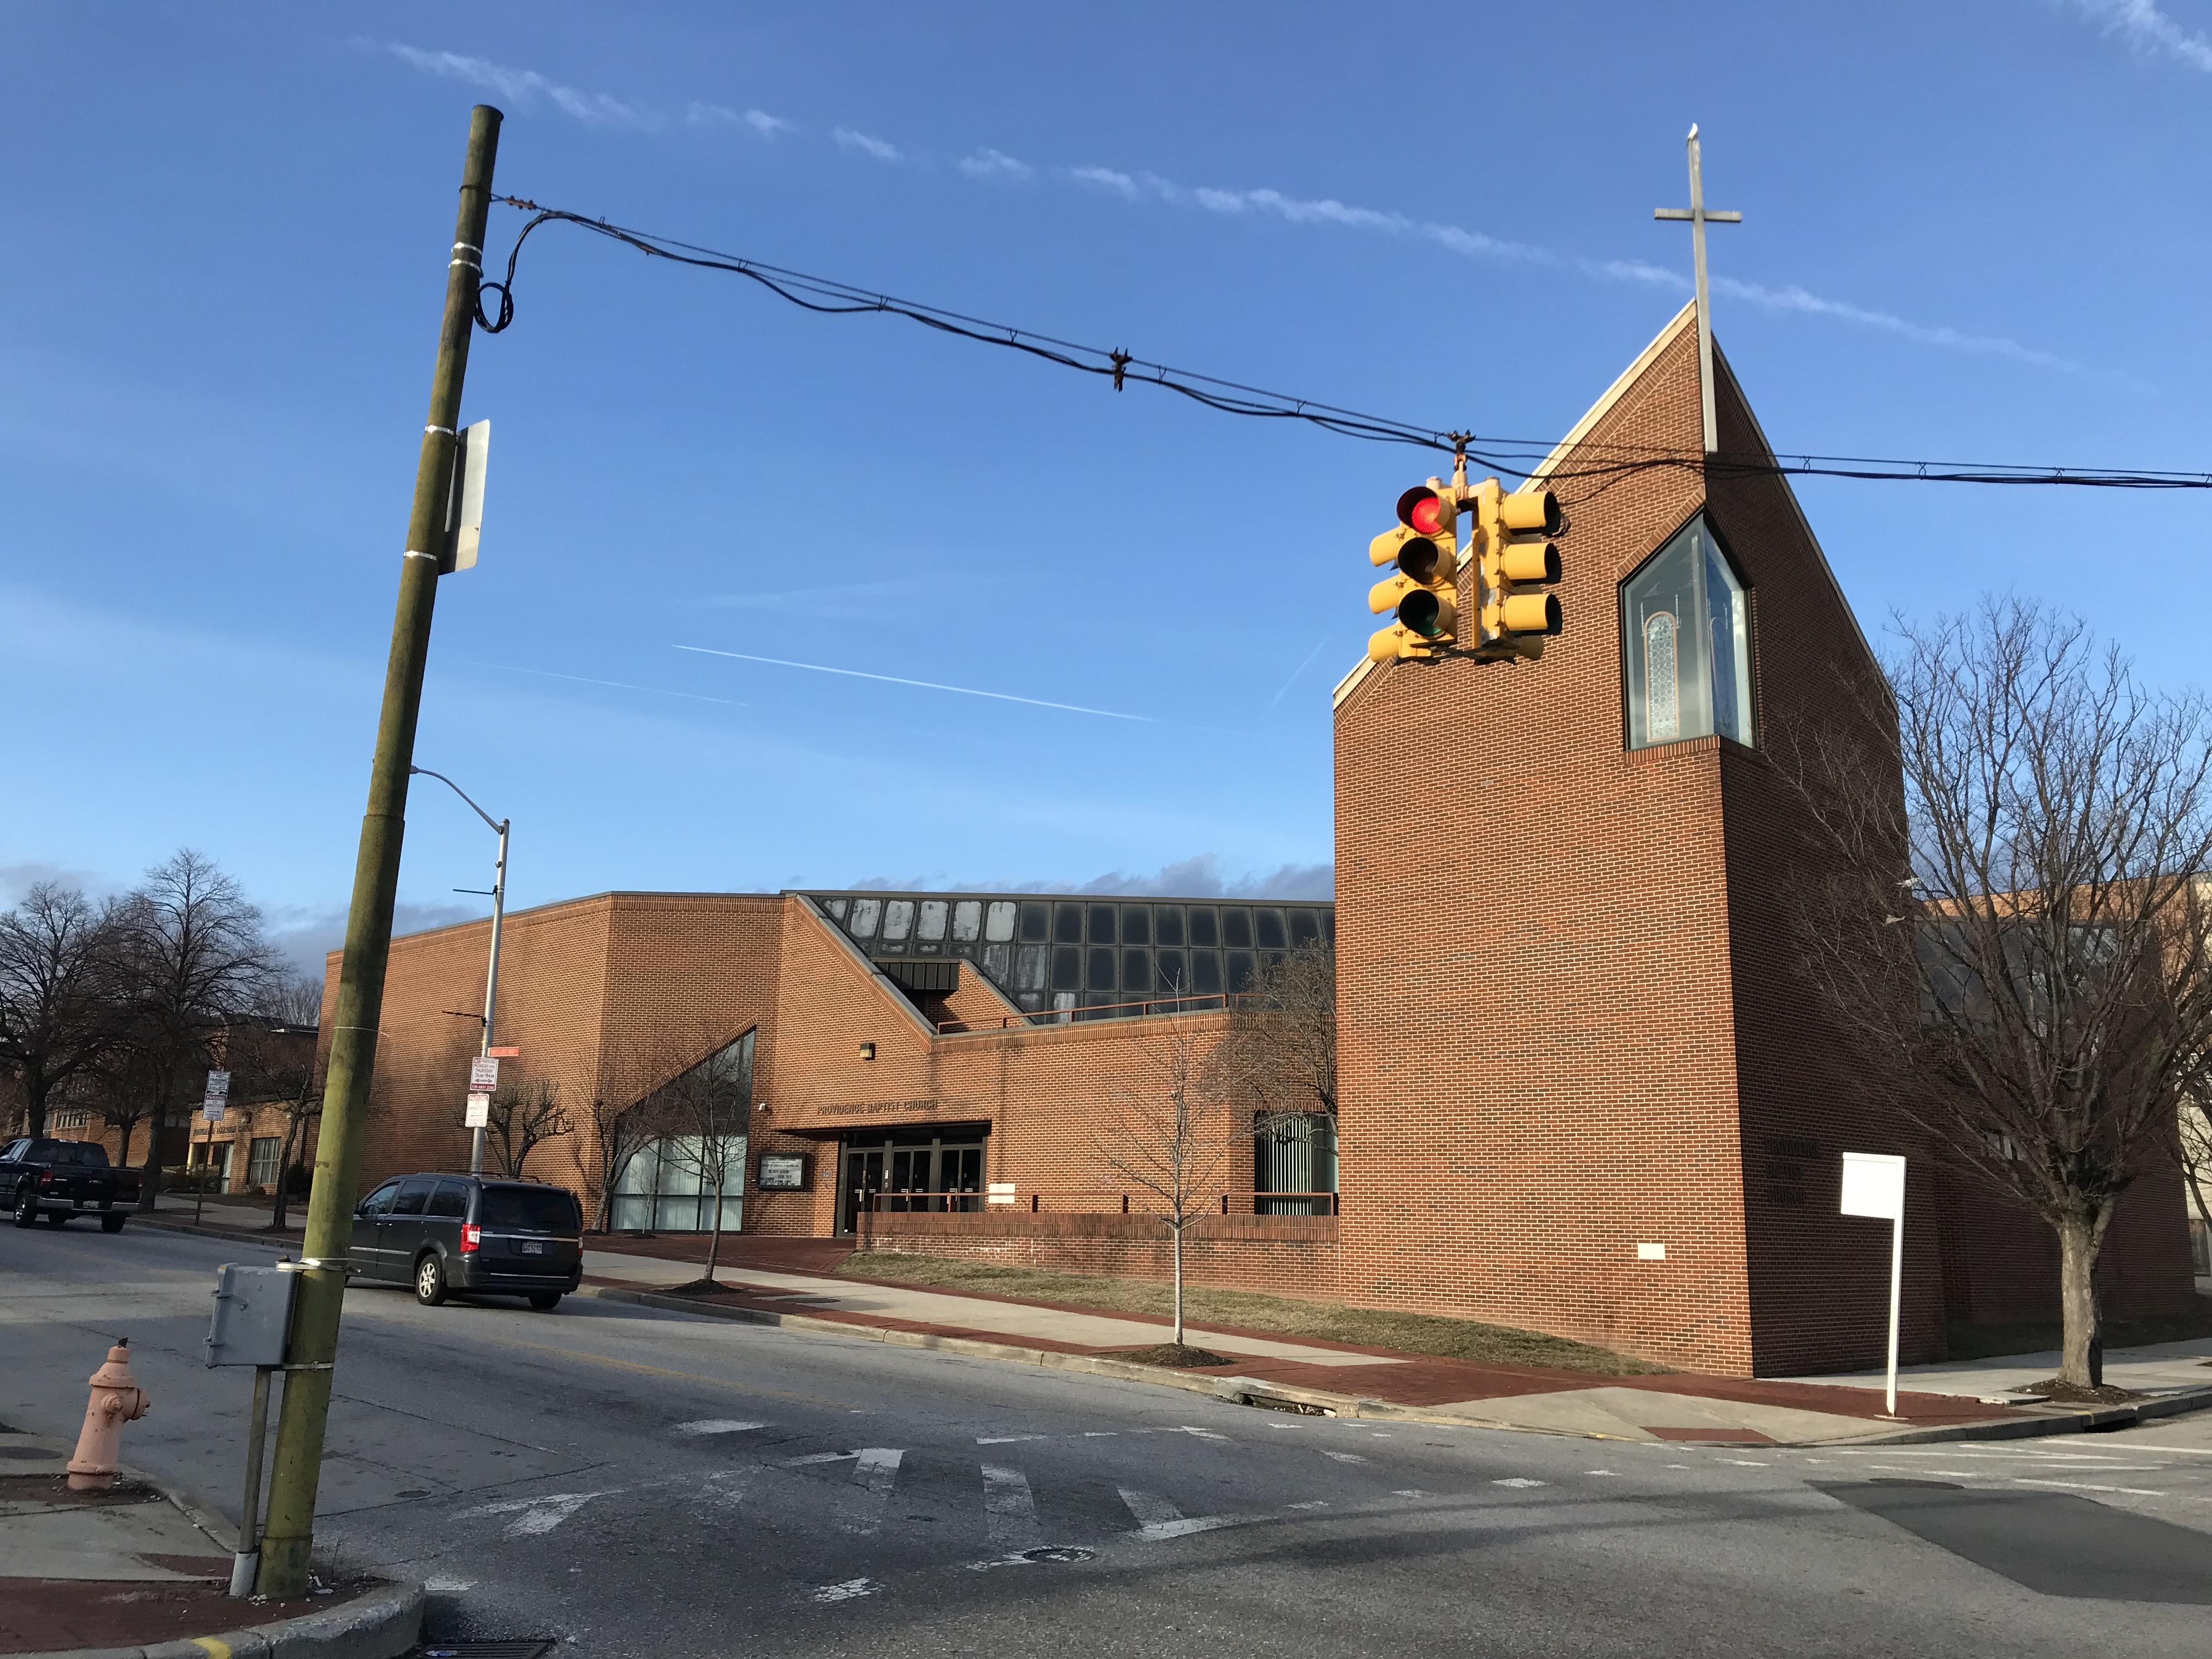 Providence baptist church, 1401 pennsylvania avenue, baltimore, md 21217 photo